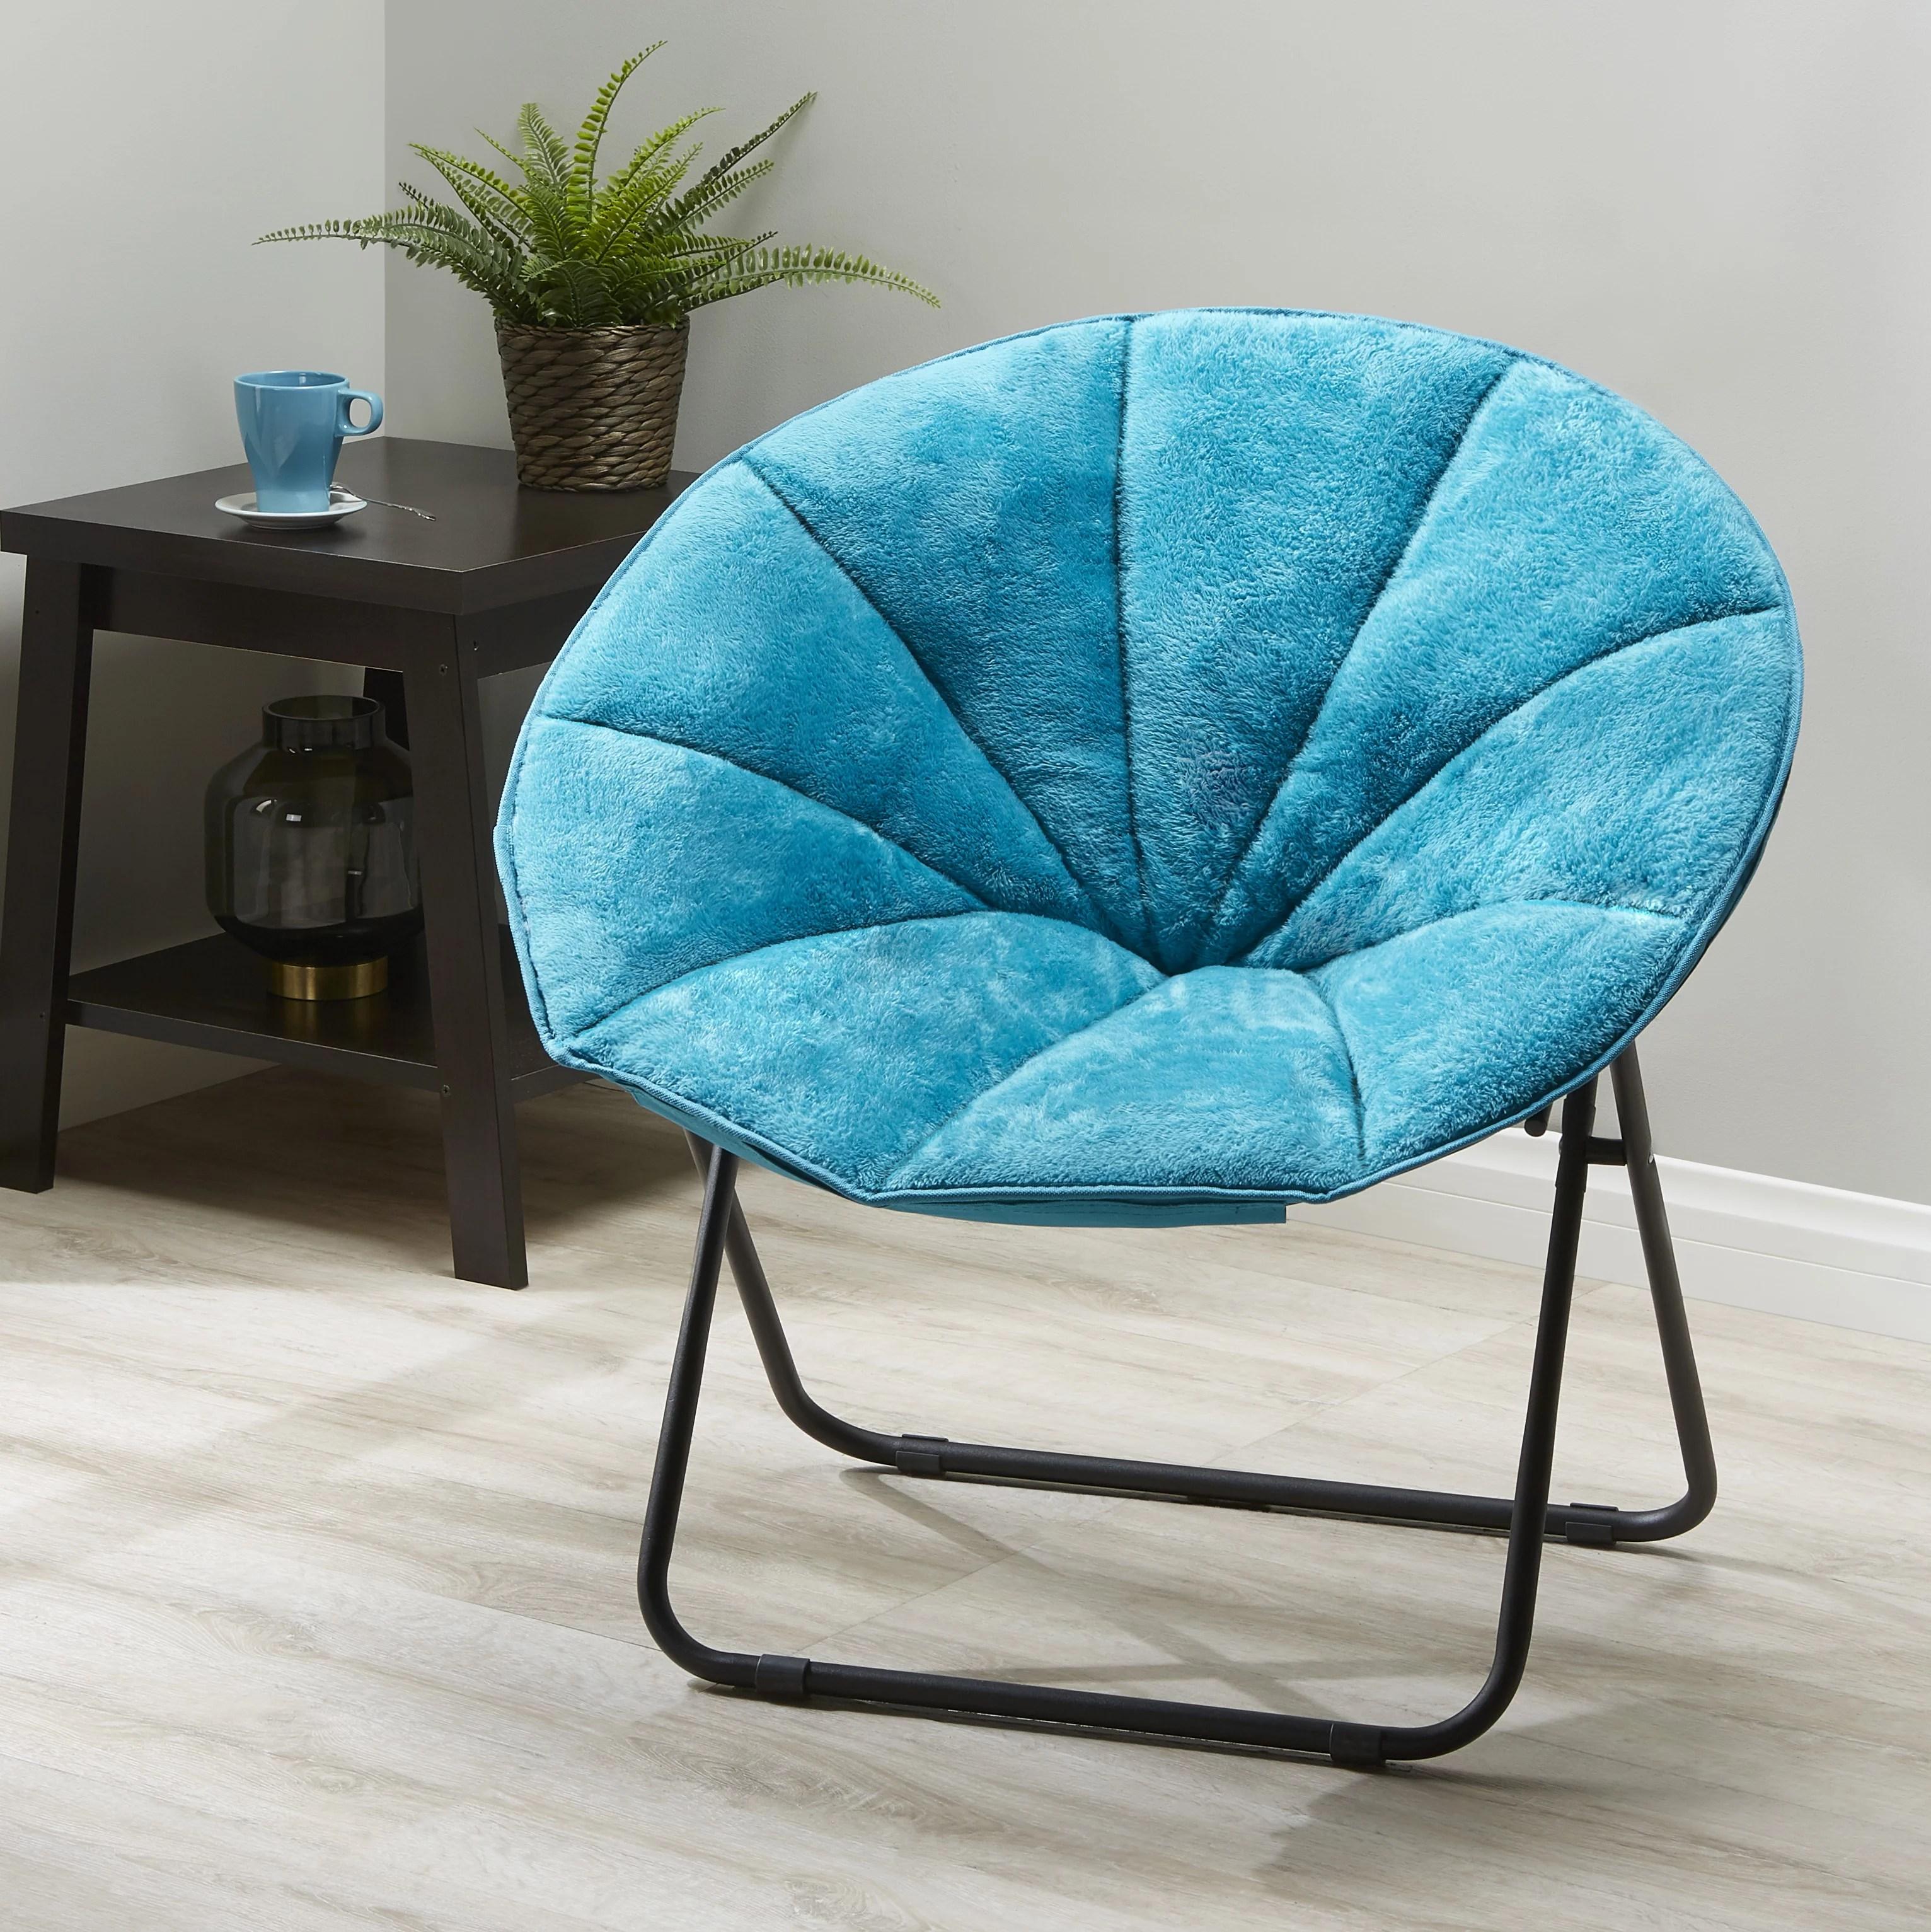 teal faux fur saucer chair rubber foot protectors mainstays folding plush multiple colors walmart com